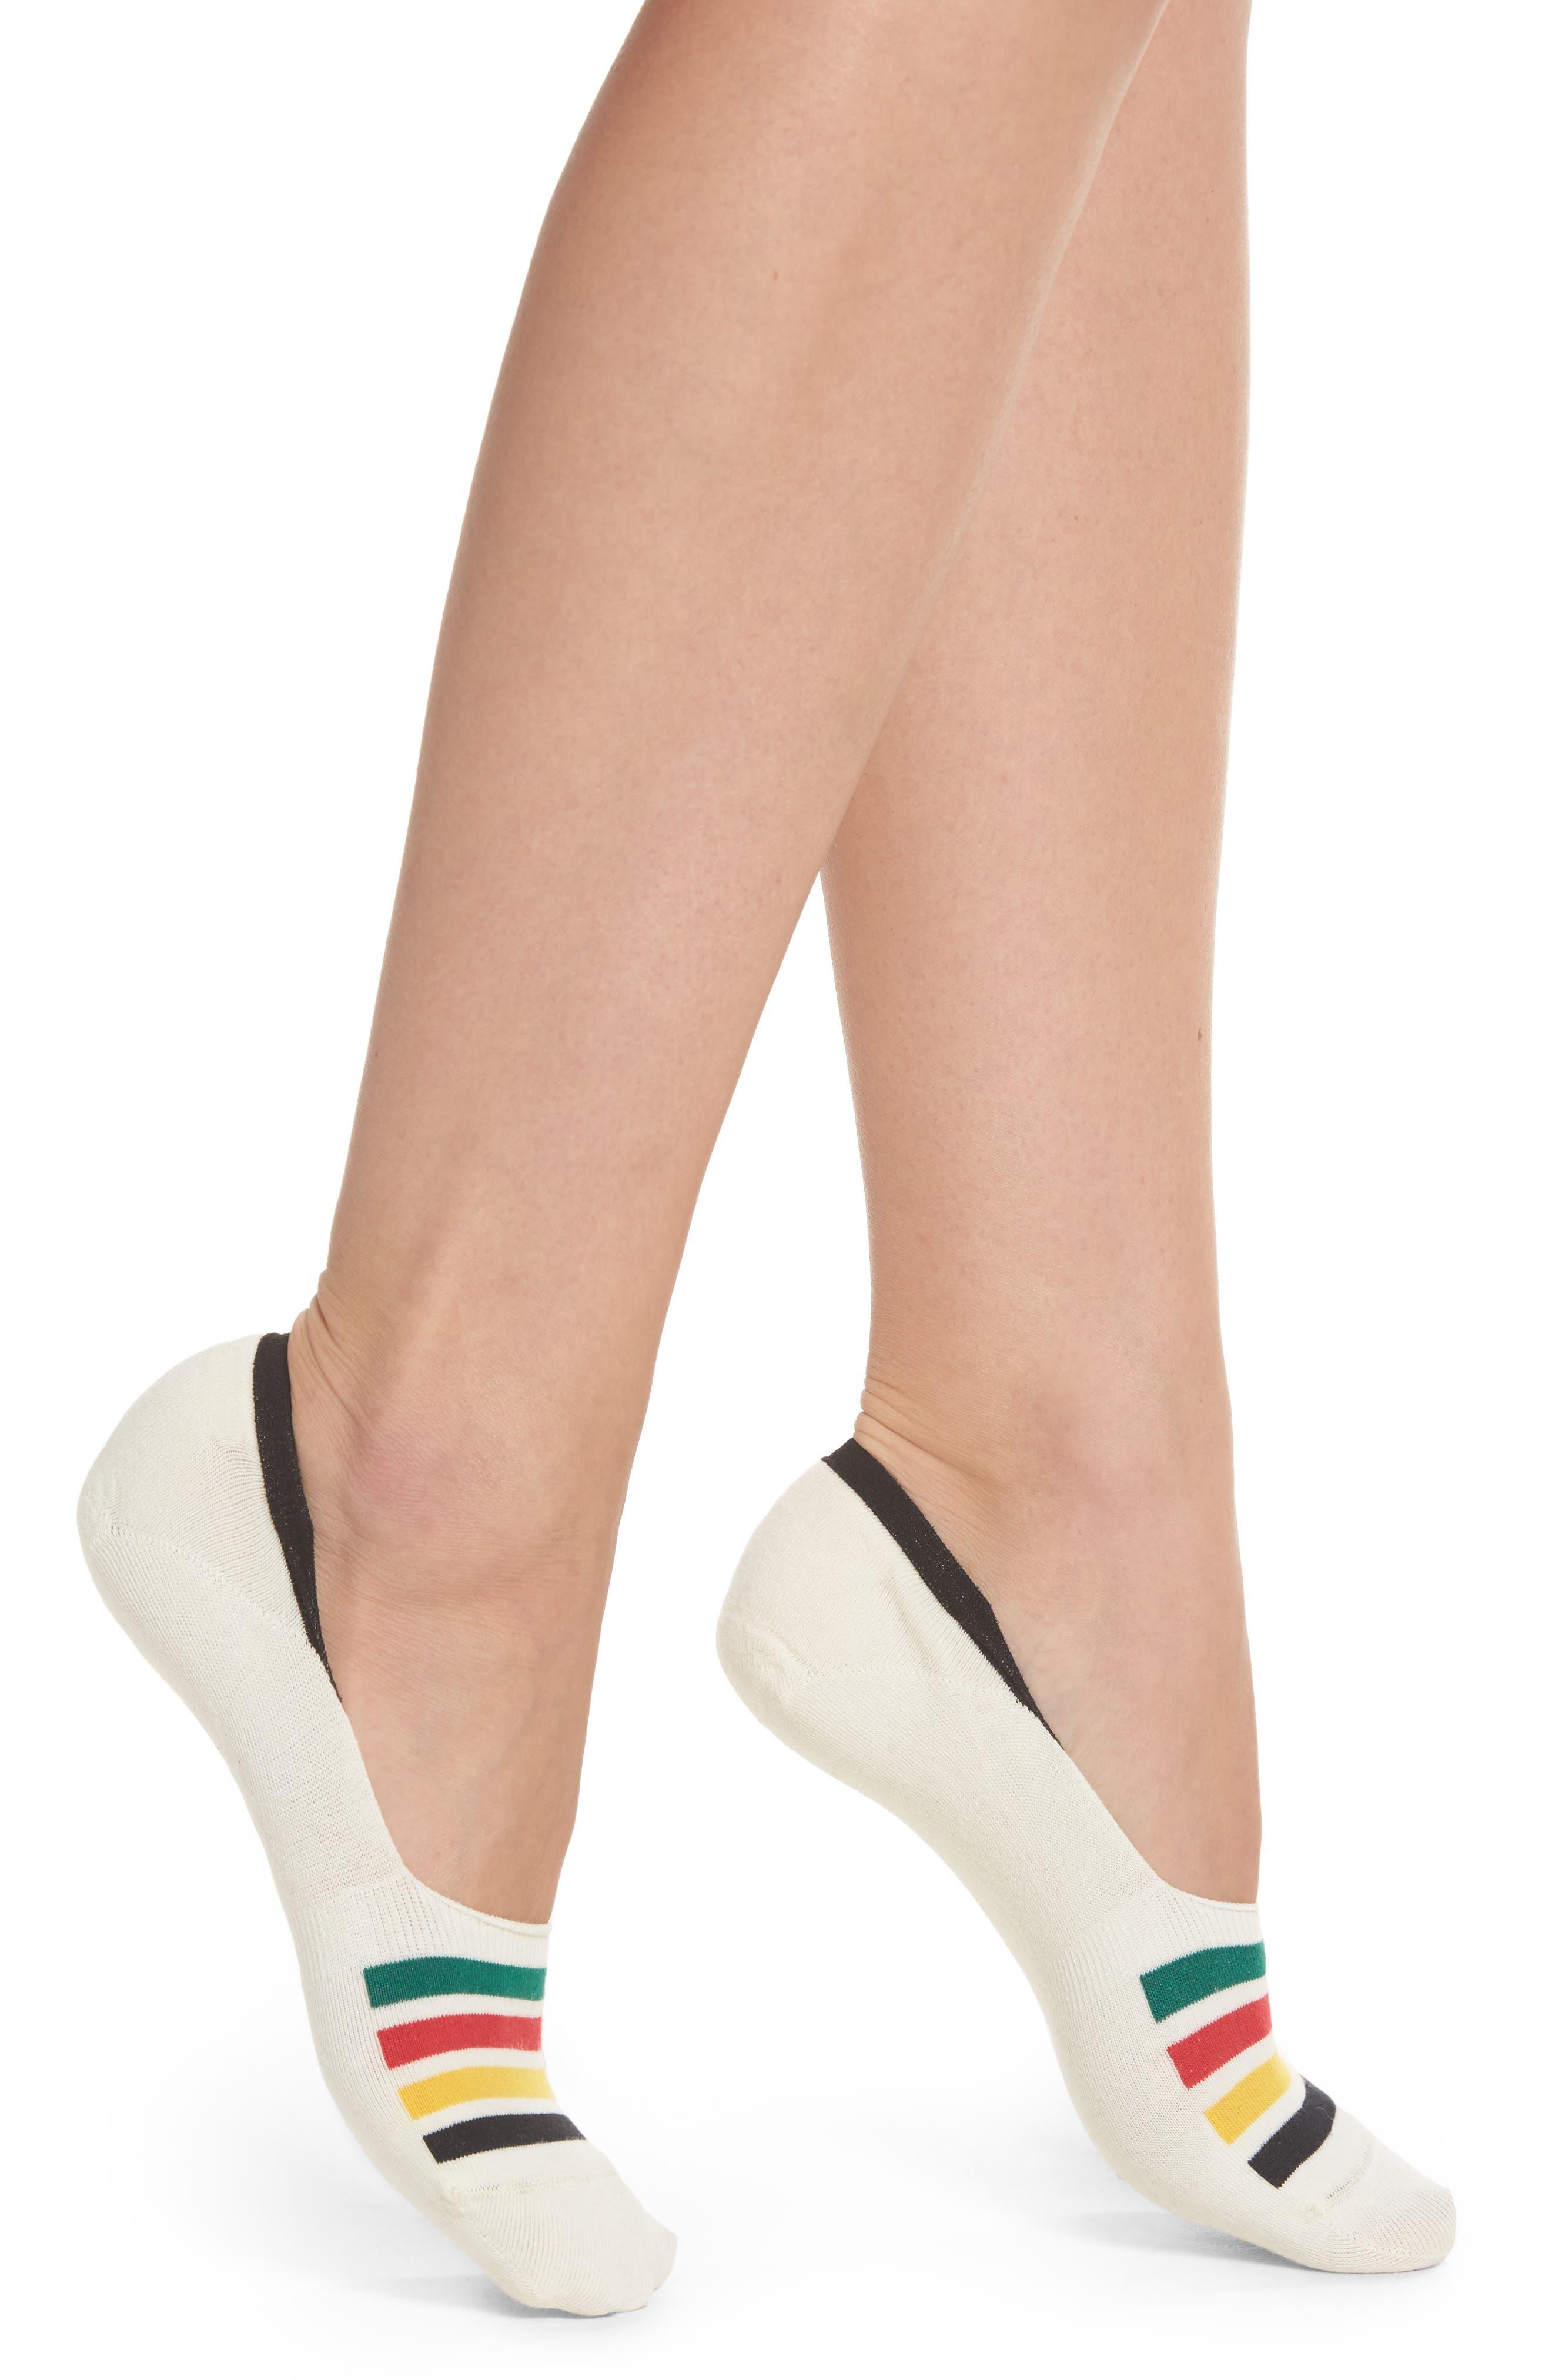 No-Show Socks,                         Main,                         color, 900